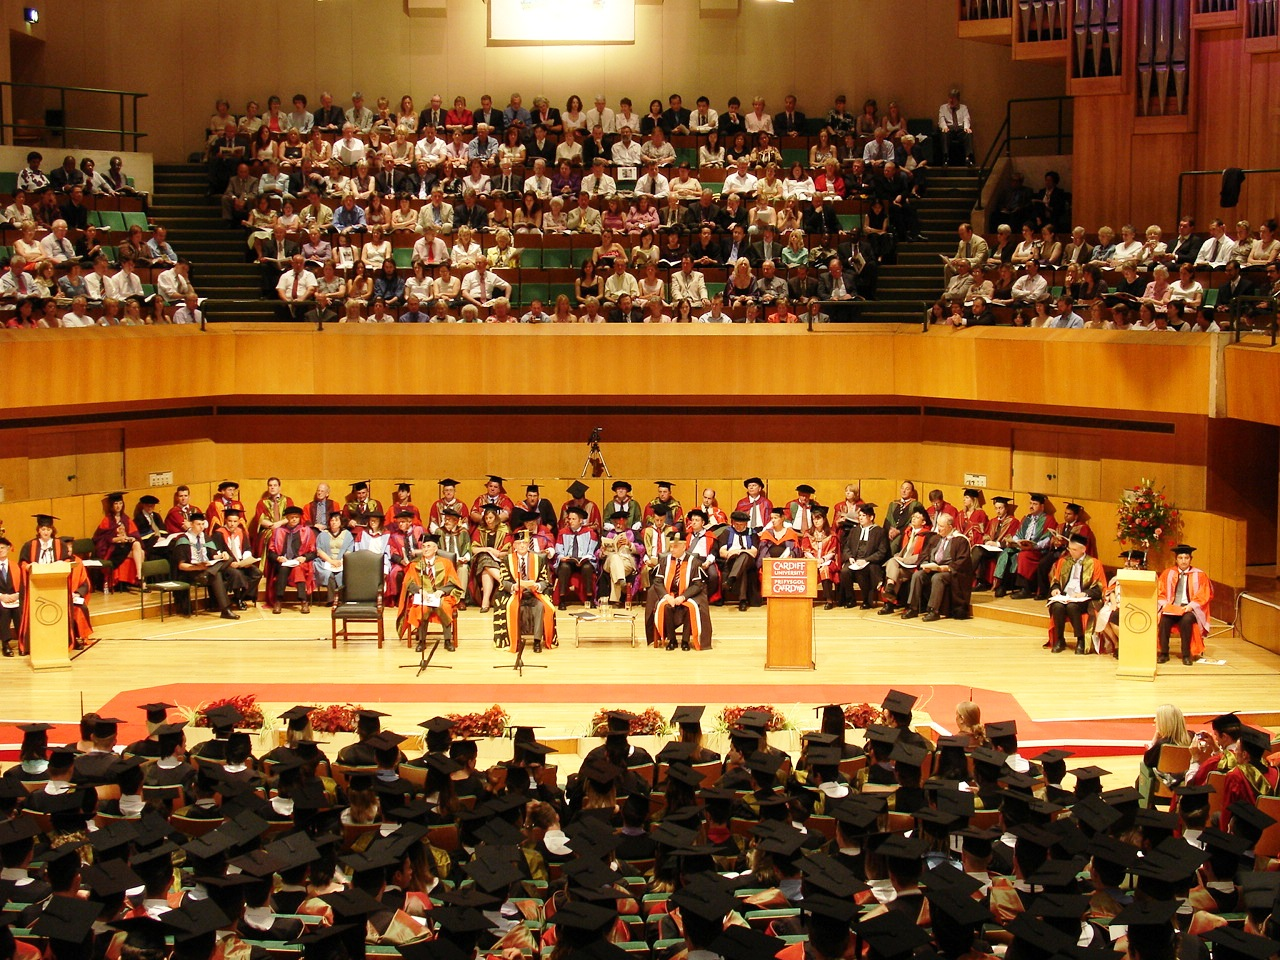 File:Cardiff University Graduation Ceremony.jpg - Wikipedia